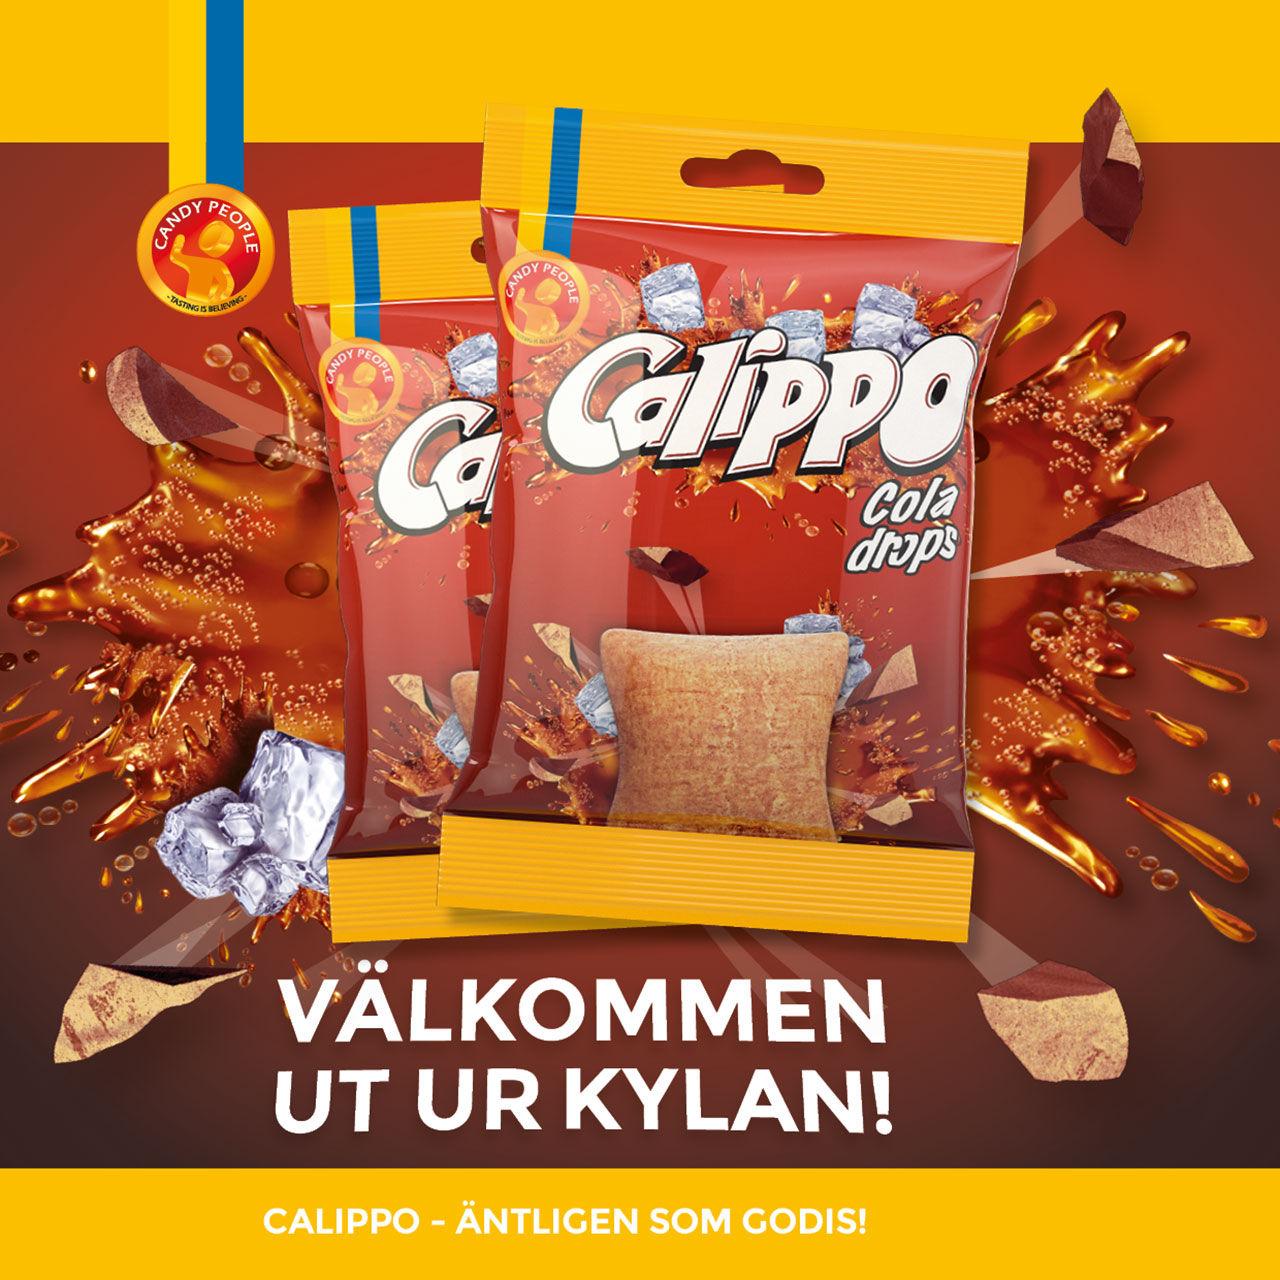 Glassen Calippo Nu Som Karamell Nyhet Fran Candy People Tjock Strupen